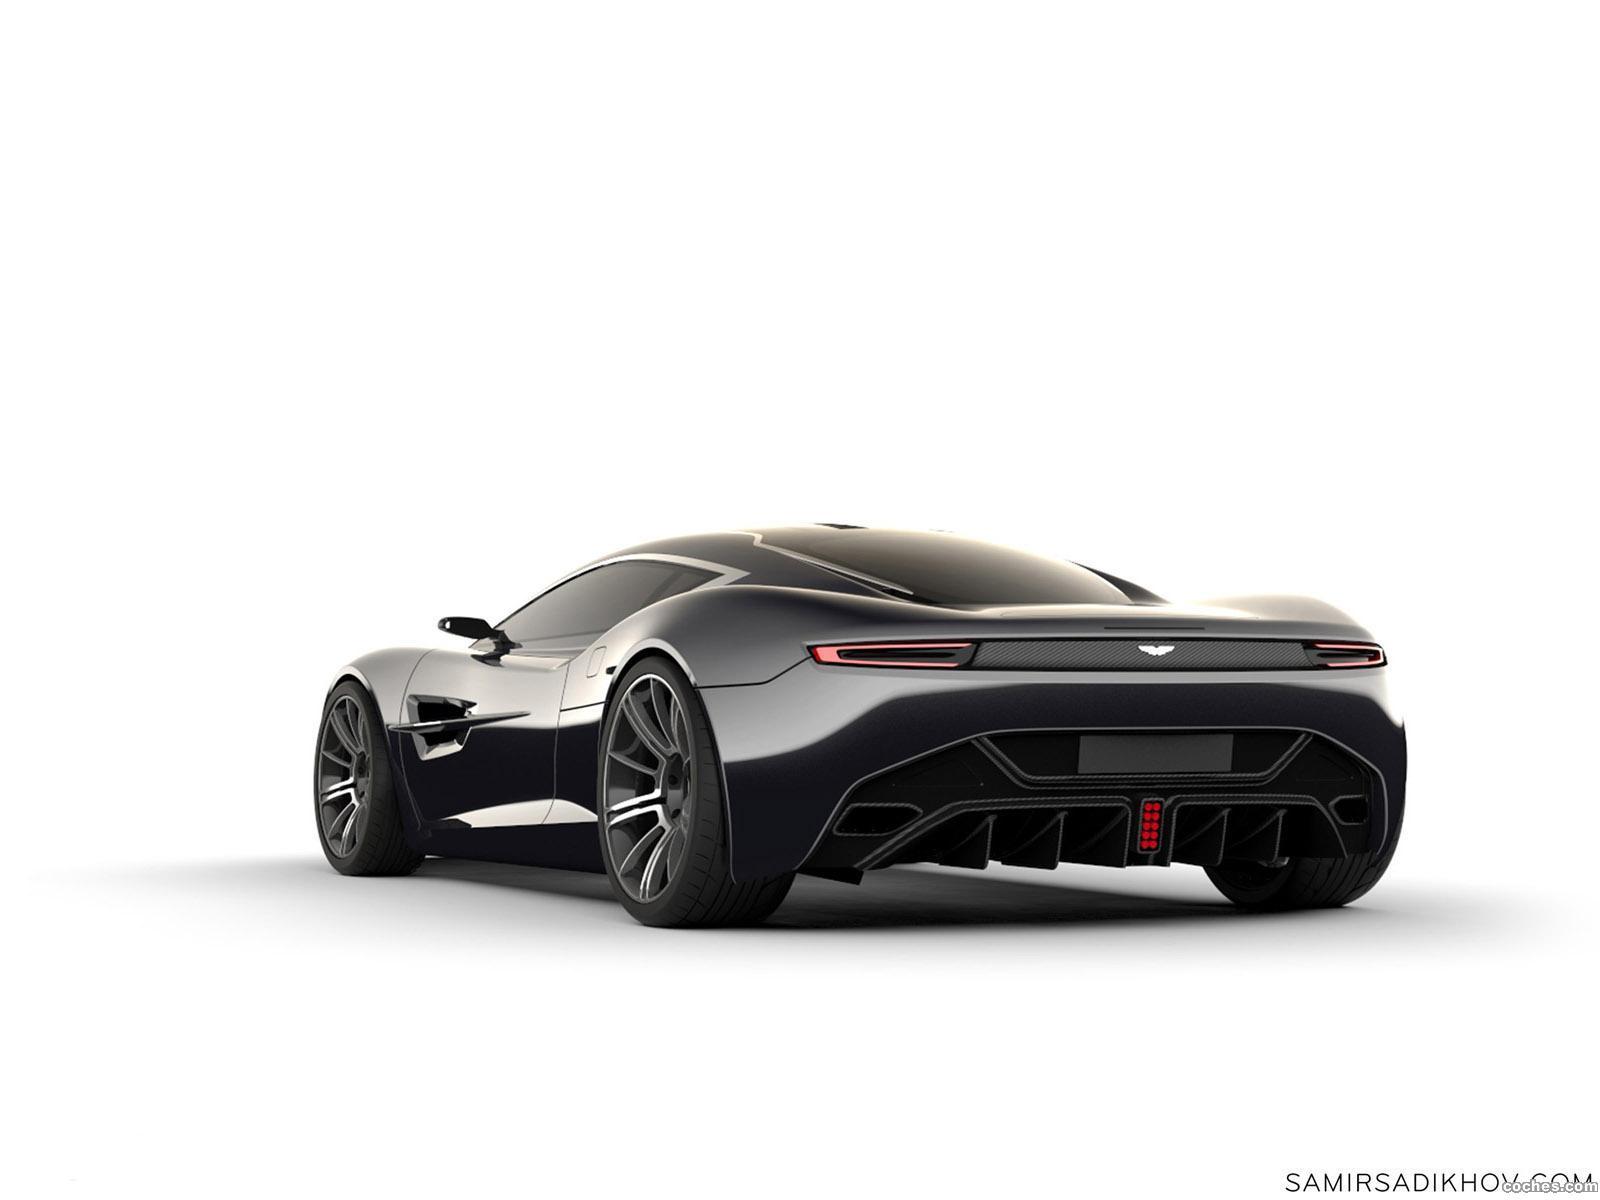 Foto 1 de Aston Martin DBC Concept Design by Samir Sadikhov 2013